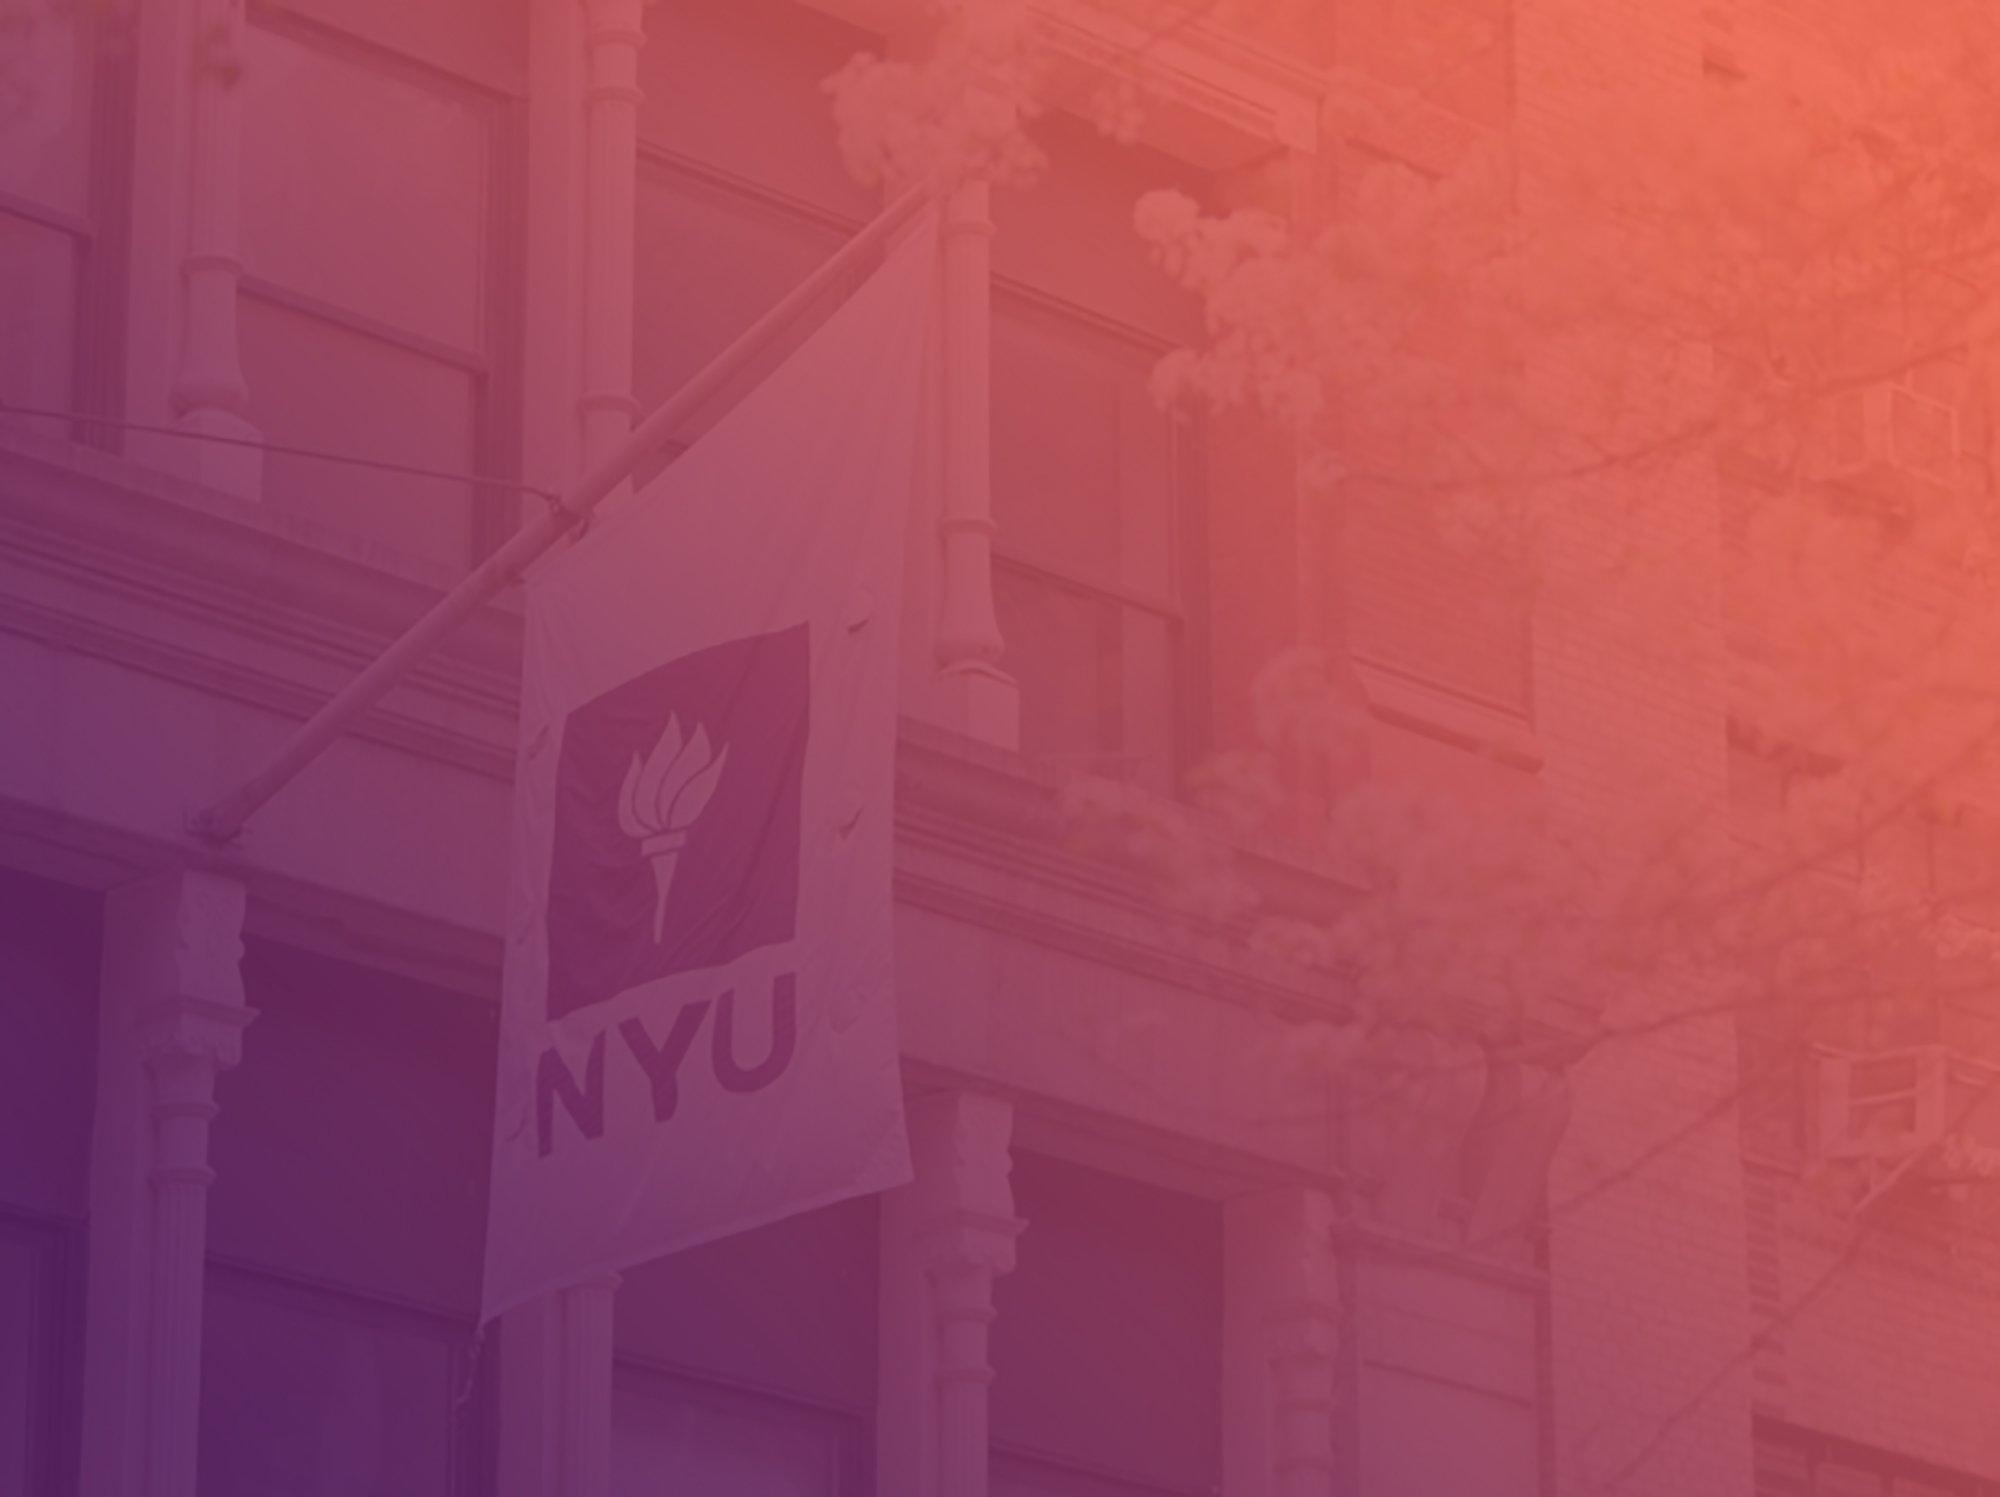 NYU-LP-Banner_12-2020_2